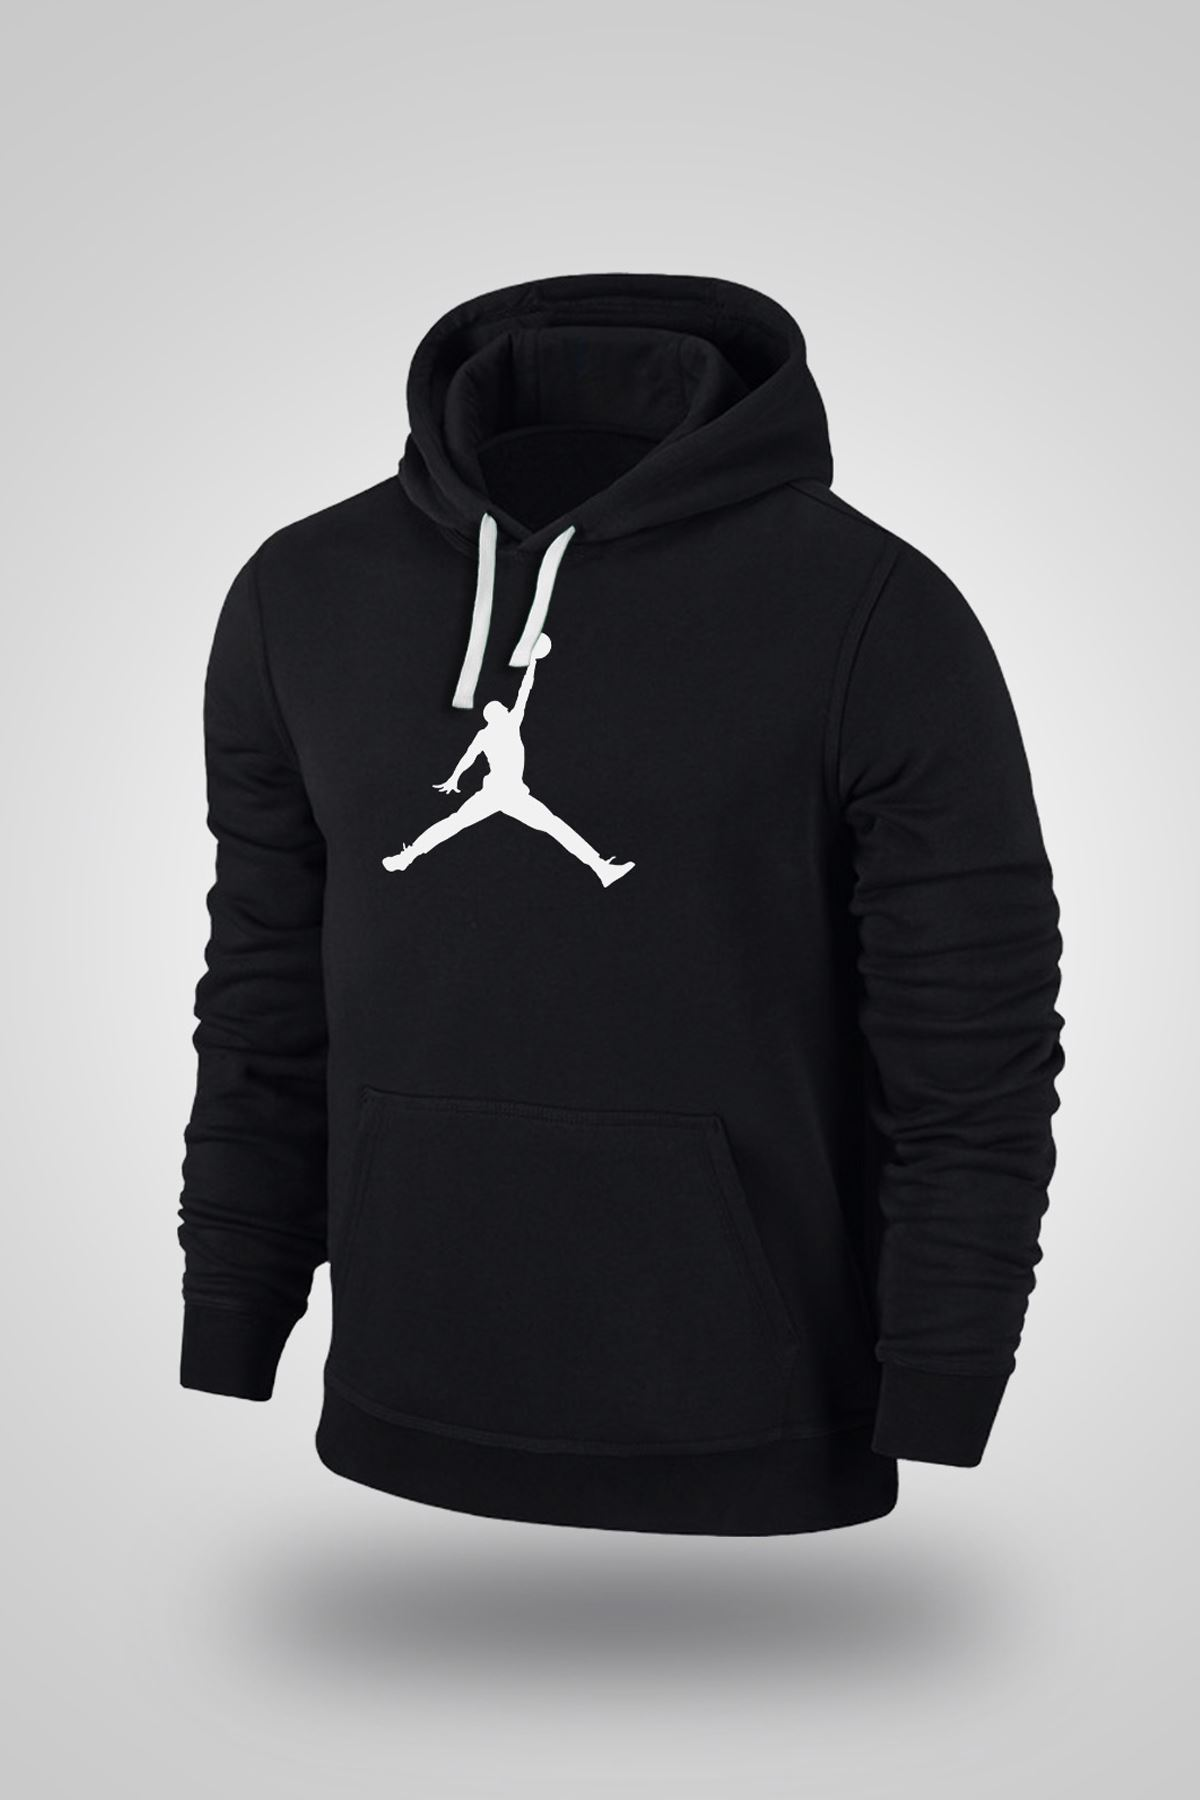 Air Jordan 02 Siyah NBA Erkek Kapşonlu Sweatshirt - Hoodie